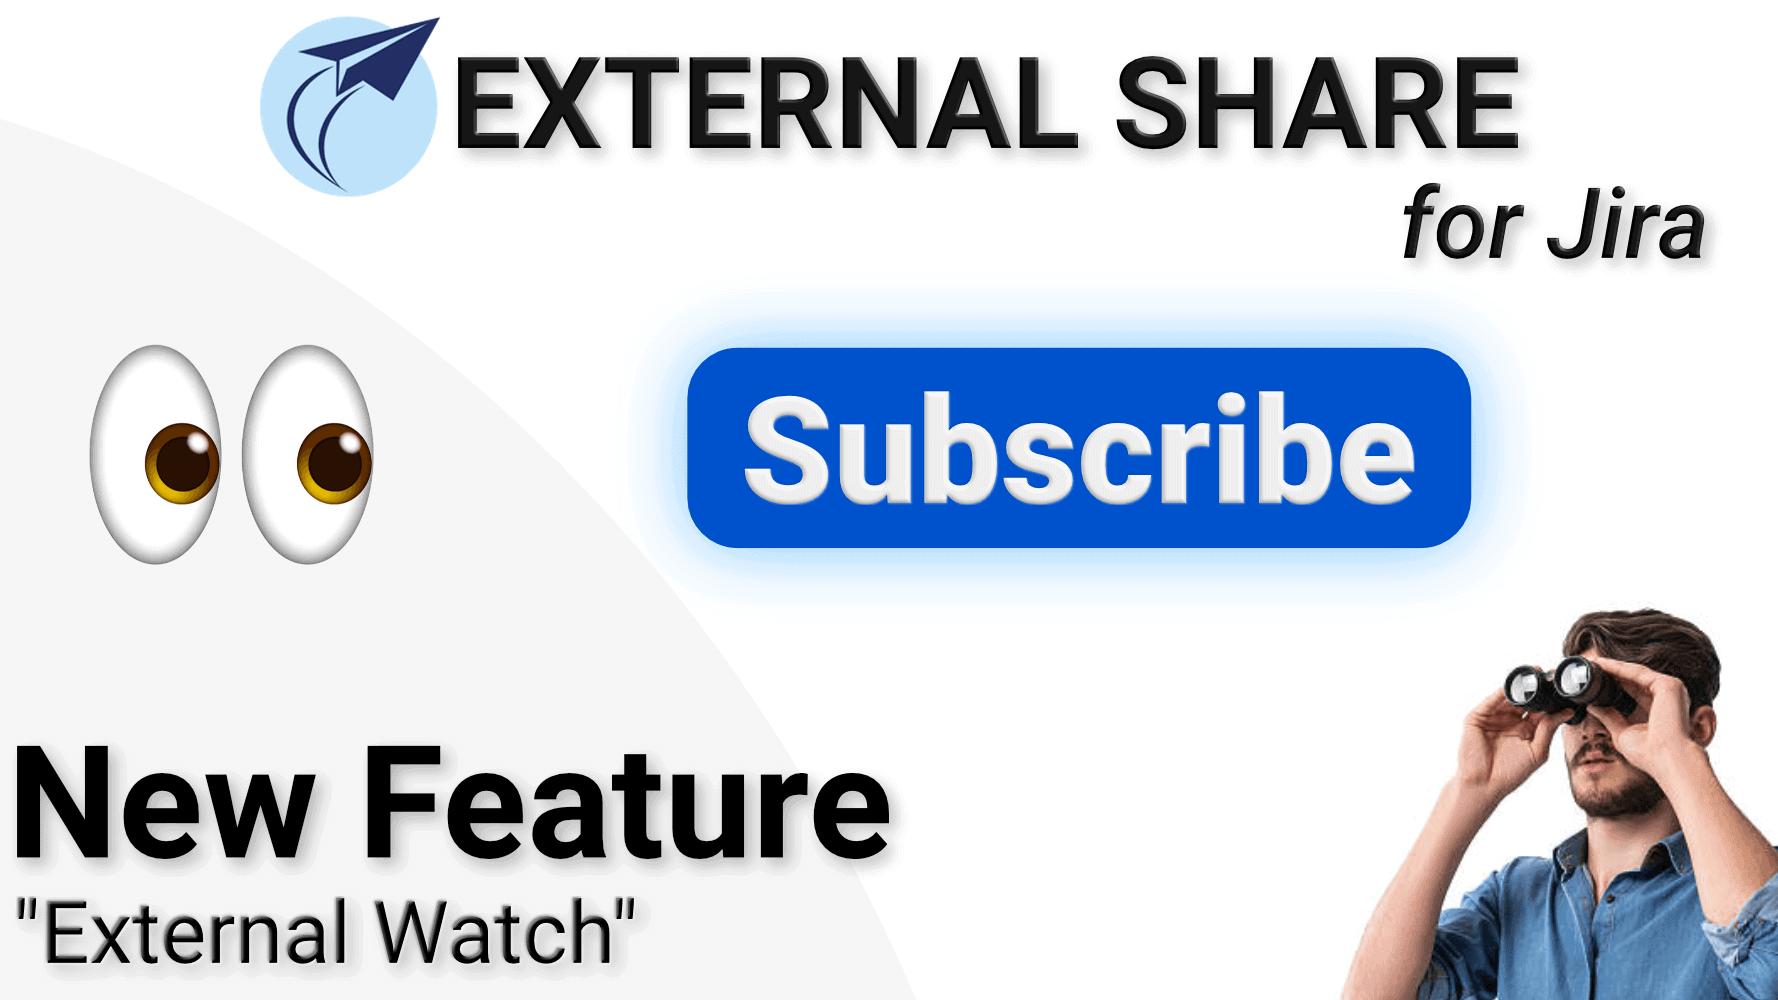 External Watch new feature article header image